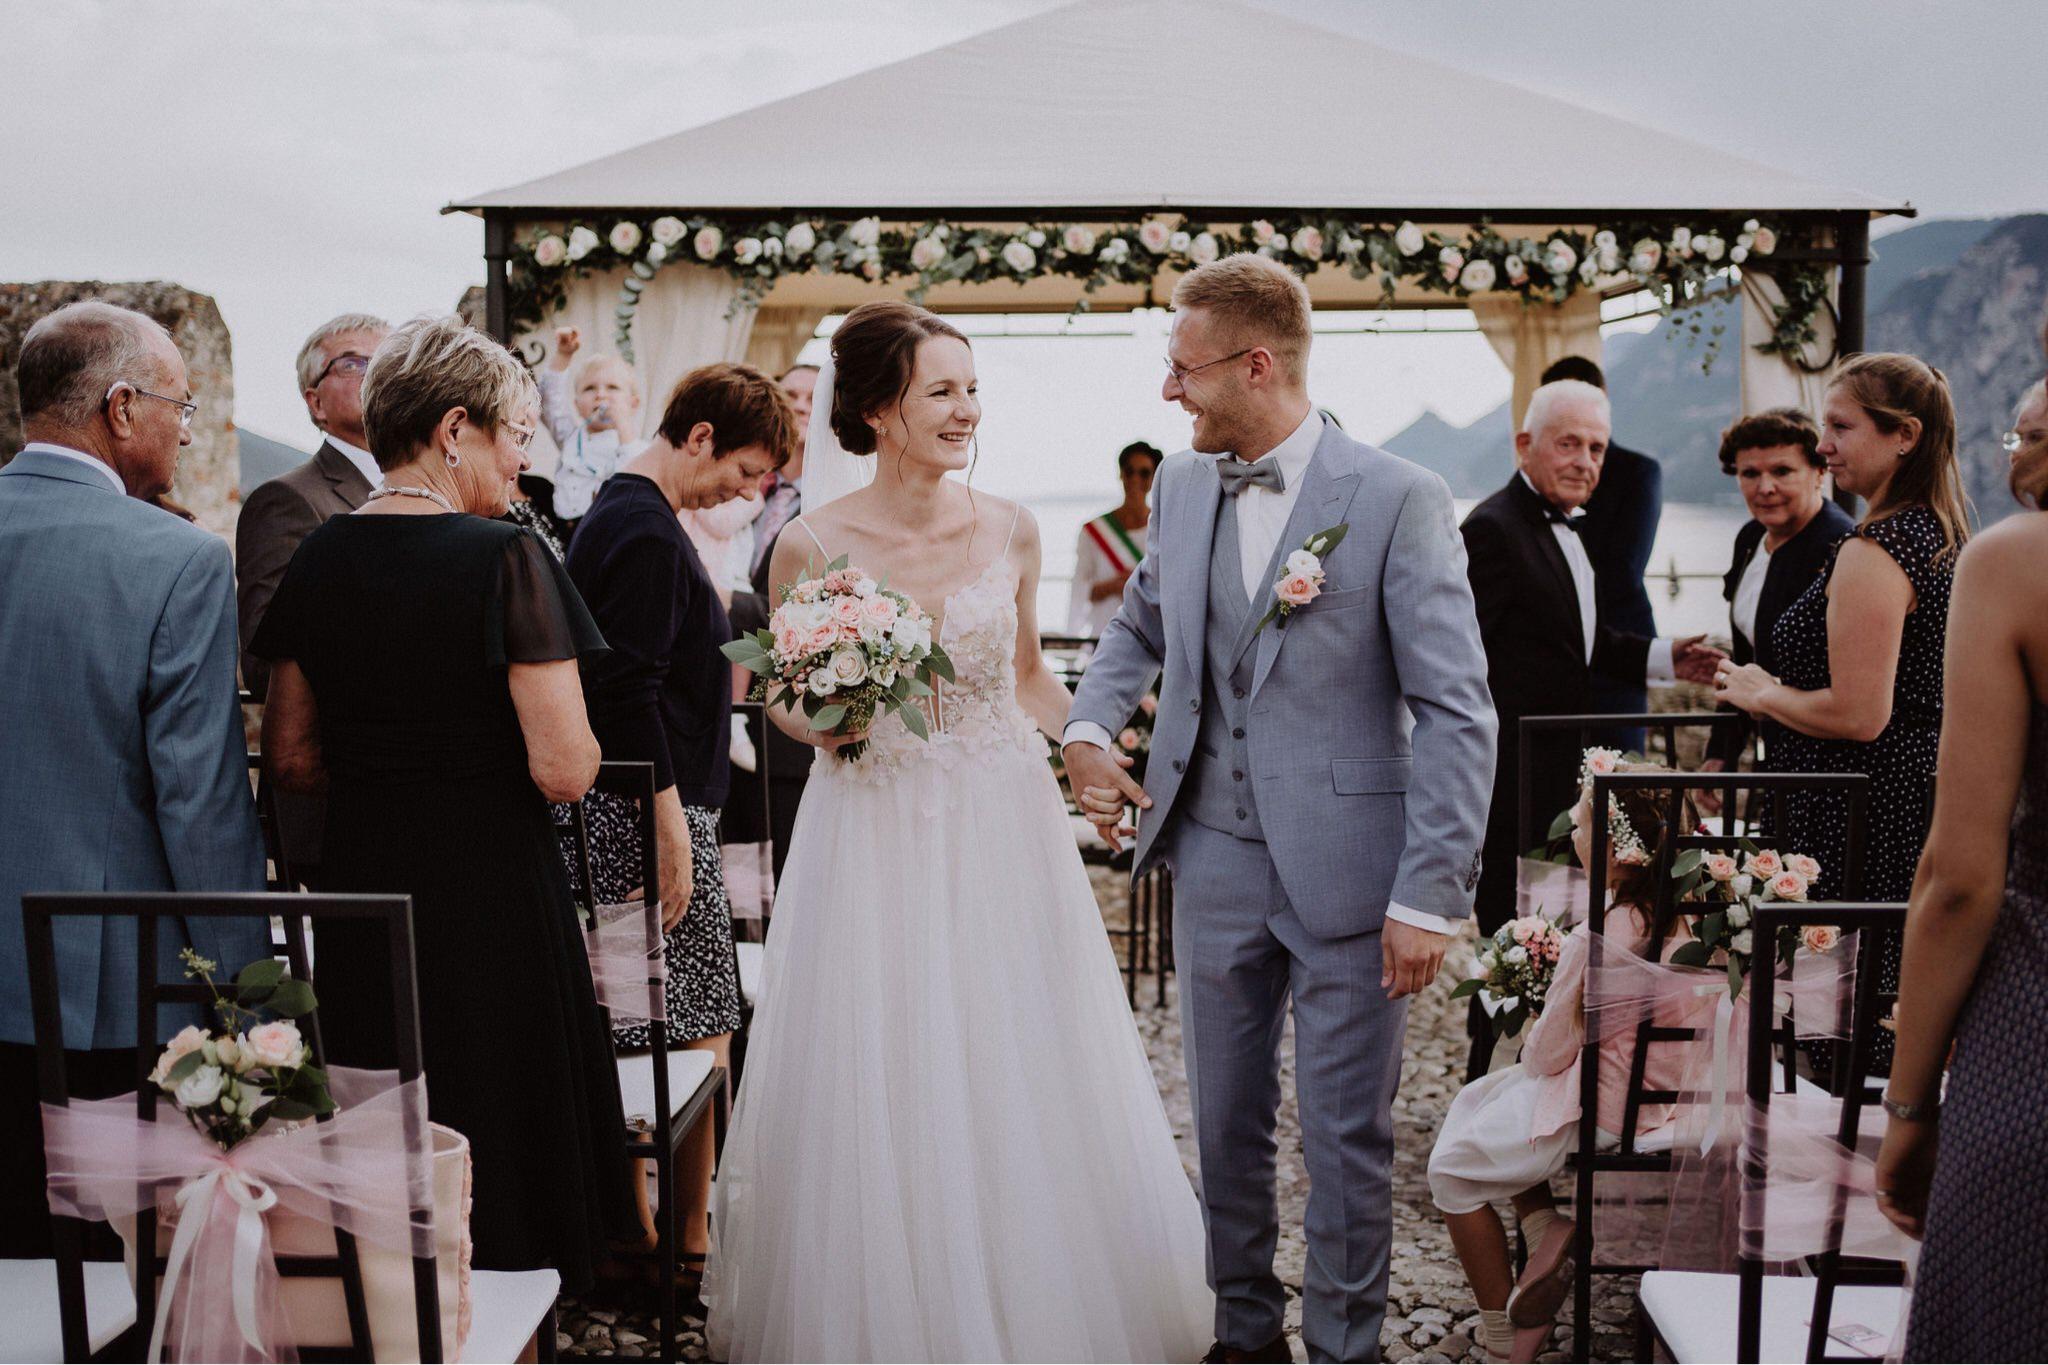 41 la 03 zeremonie 1134 weddinphotographer Hochzeitsfotograf newzealand hamilton Weddingphotography Stuttgart 1